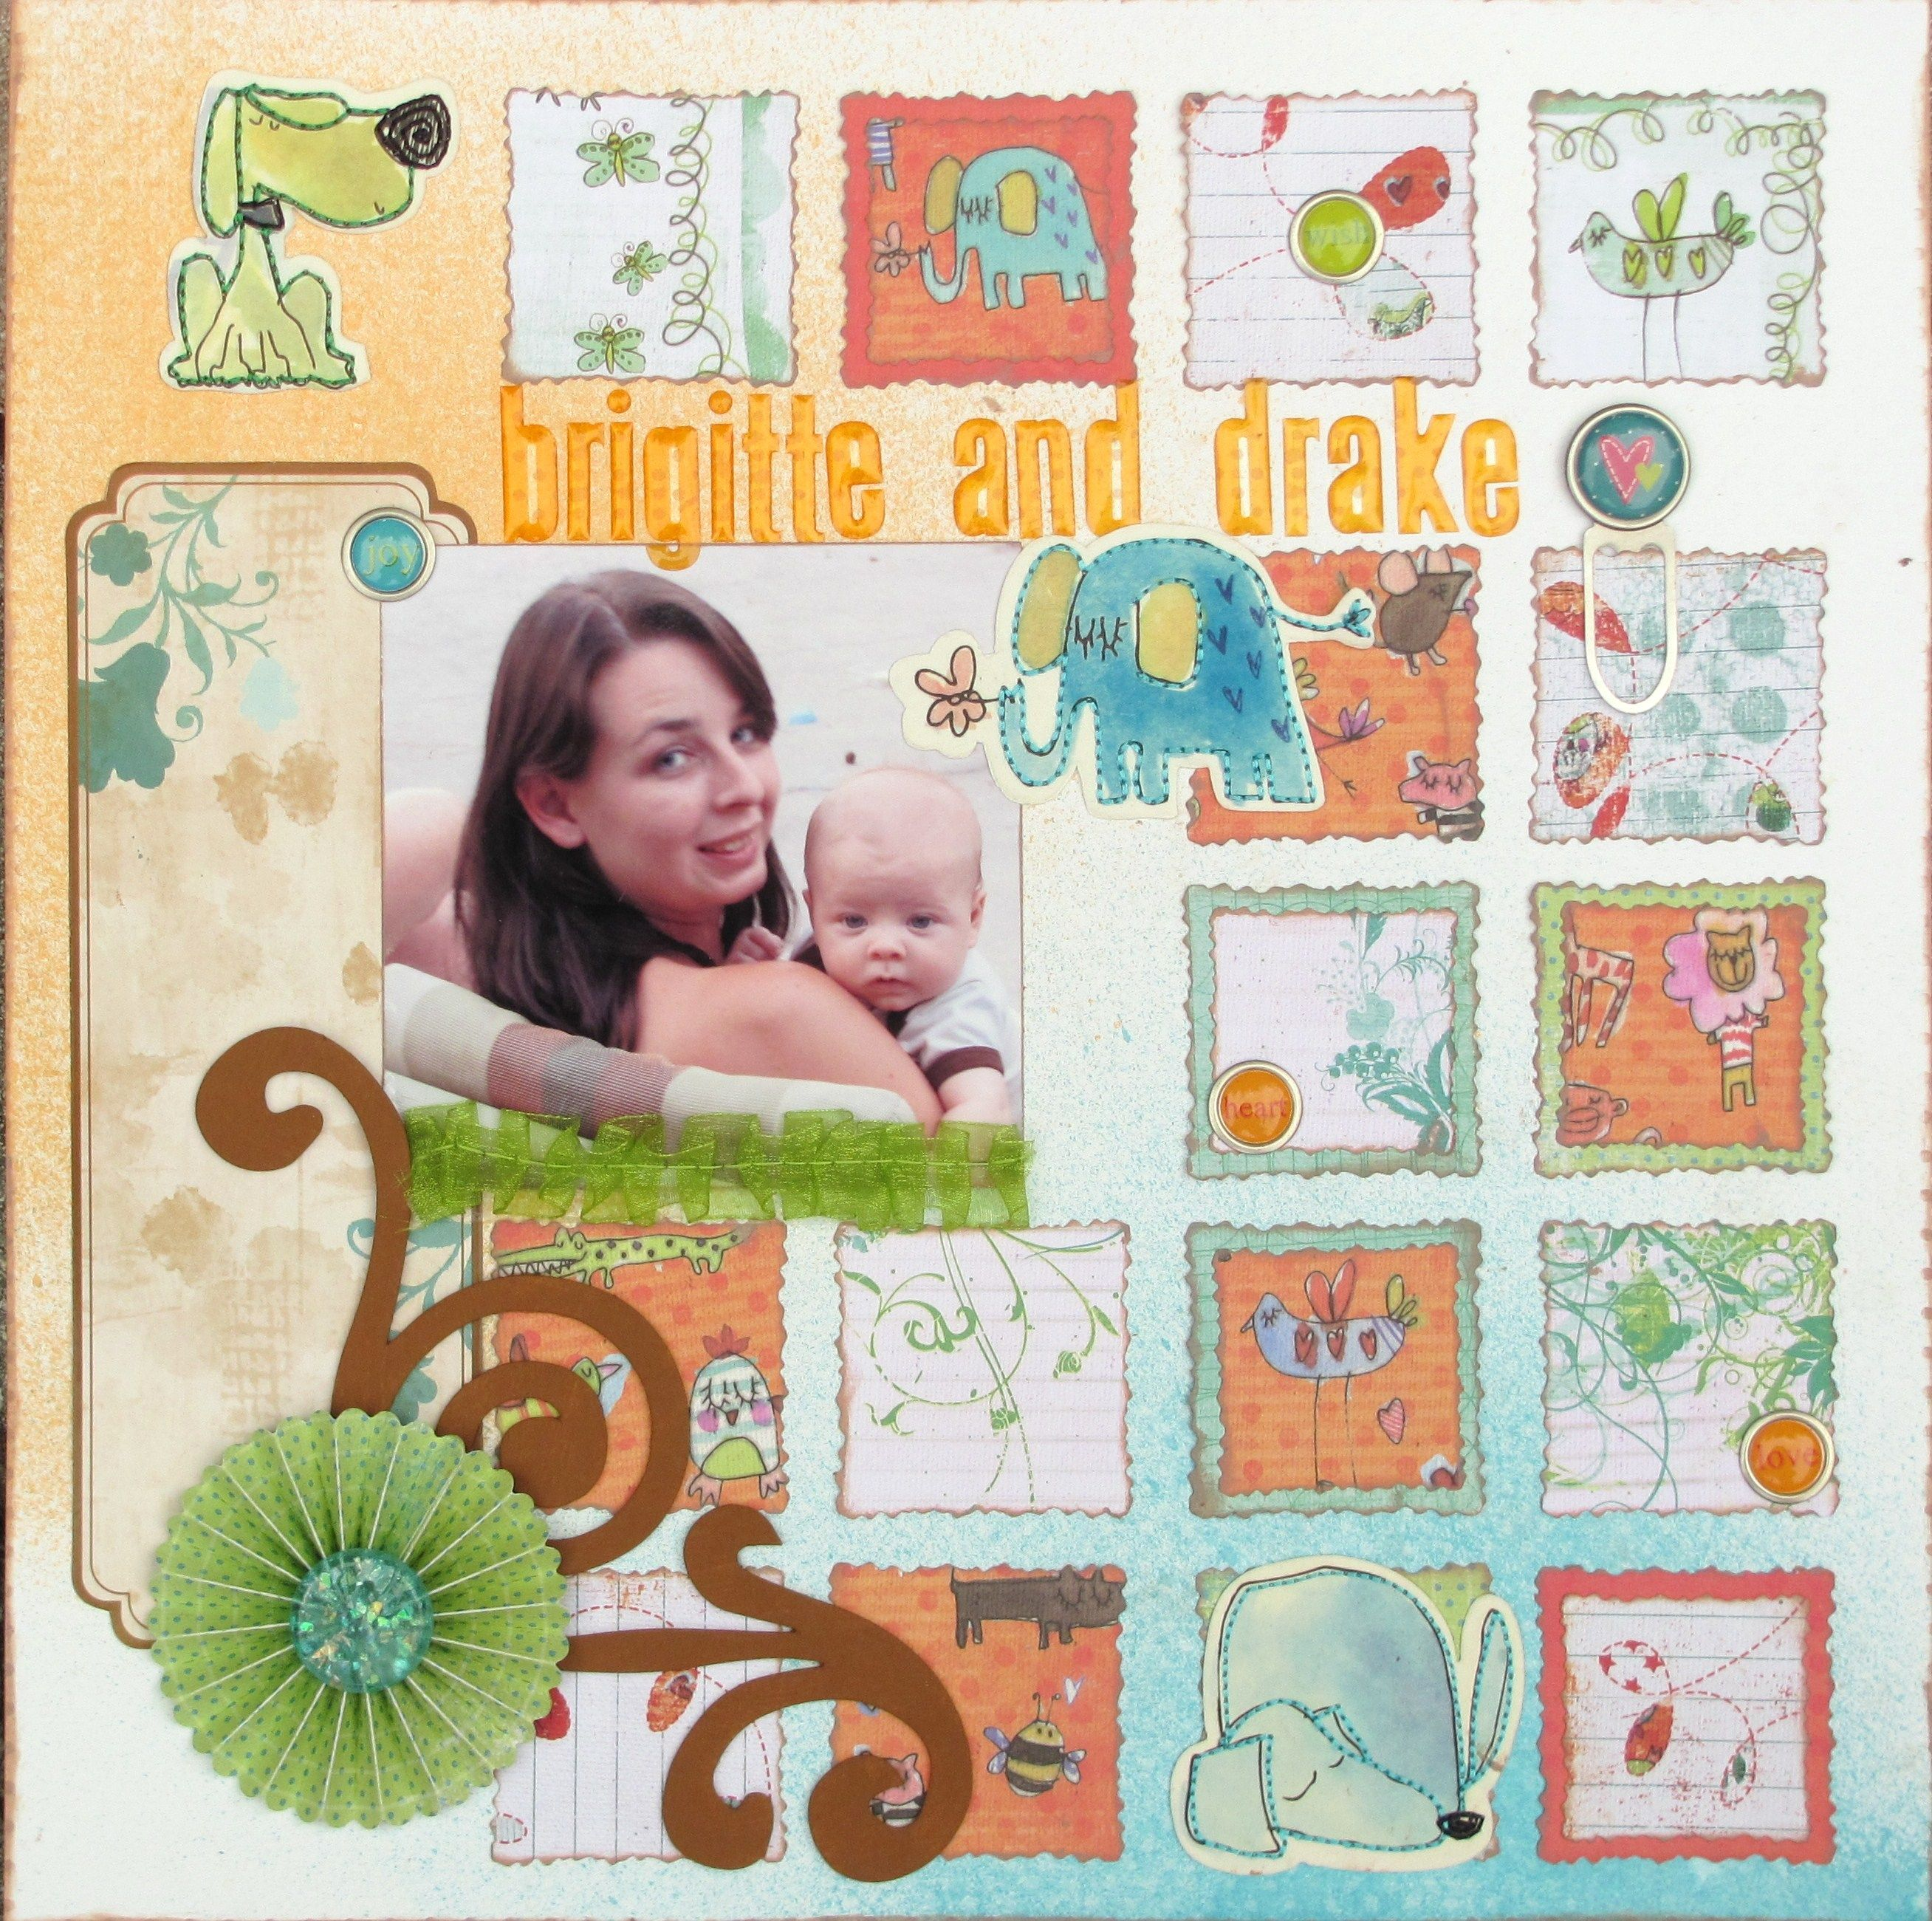 brigitte and drake - Scrapbook.com - Very pretty baby page ...